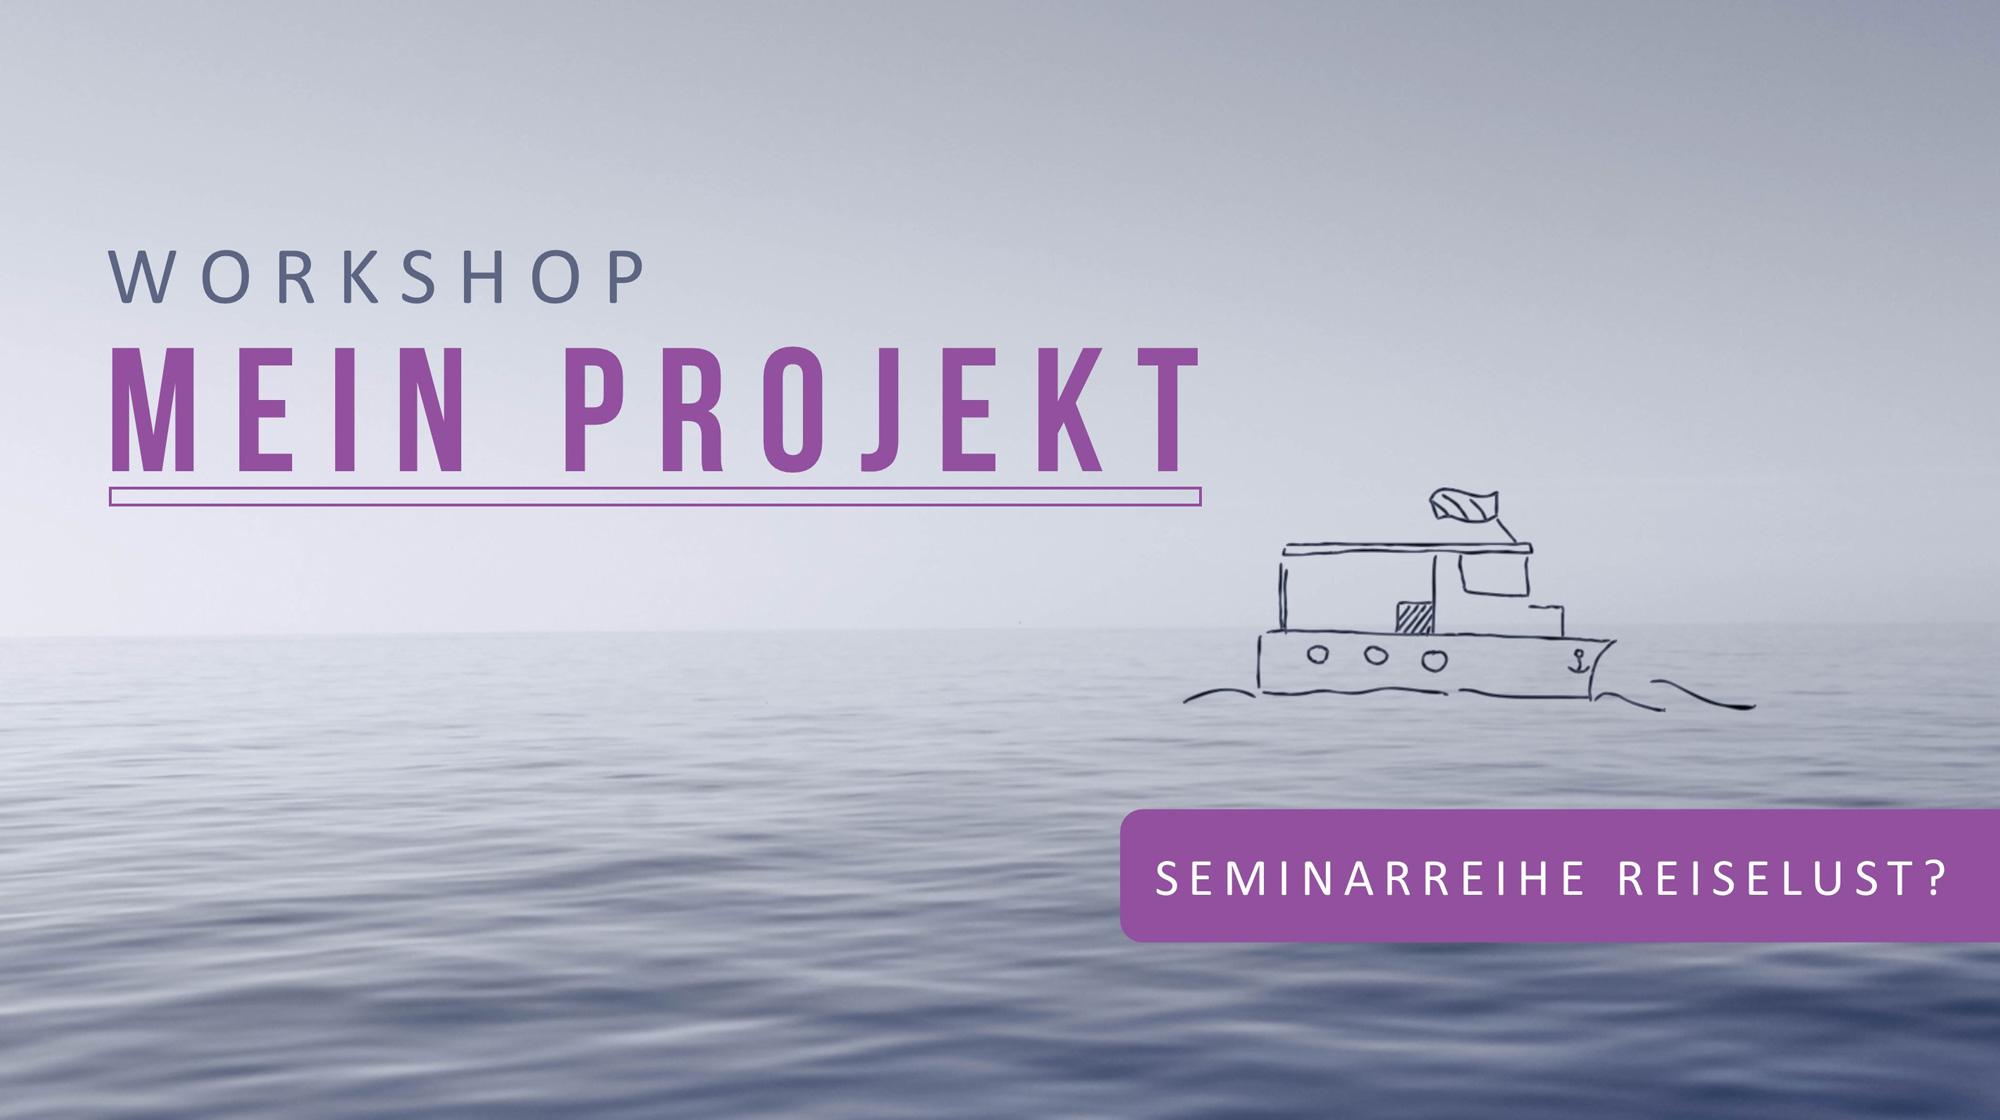 Workshop MEIN PROJEKT